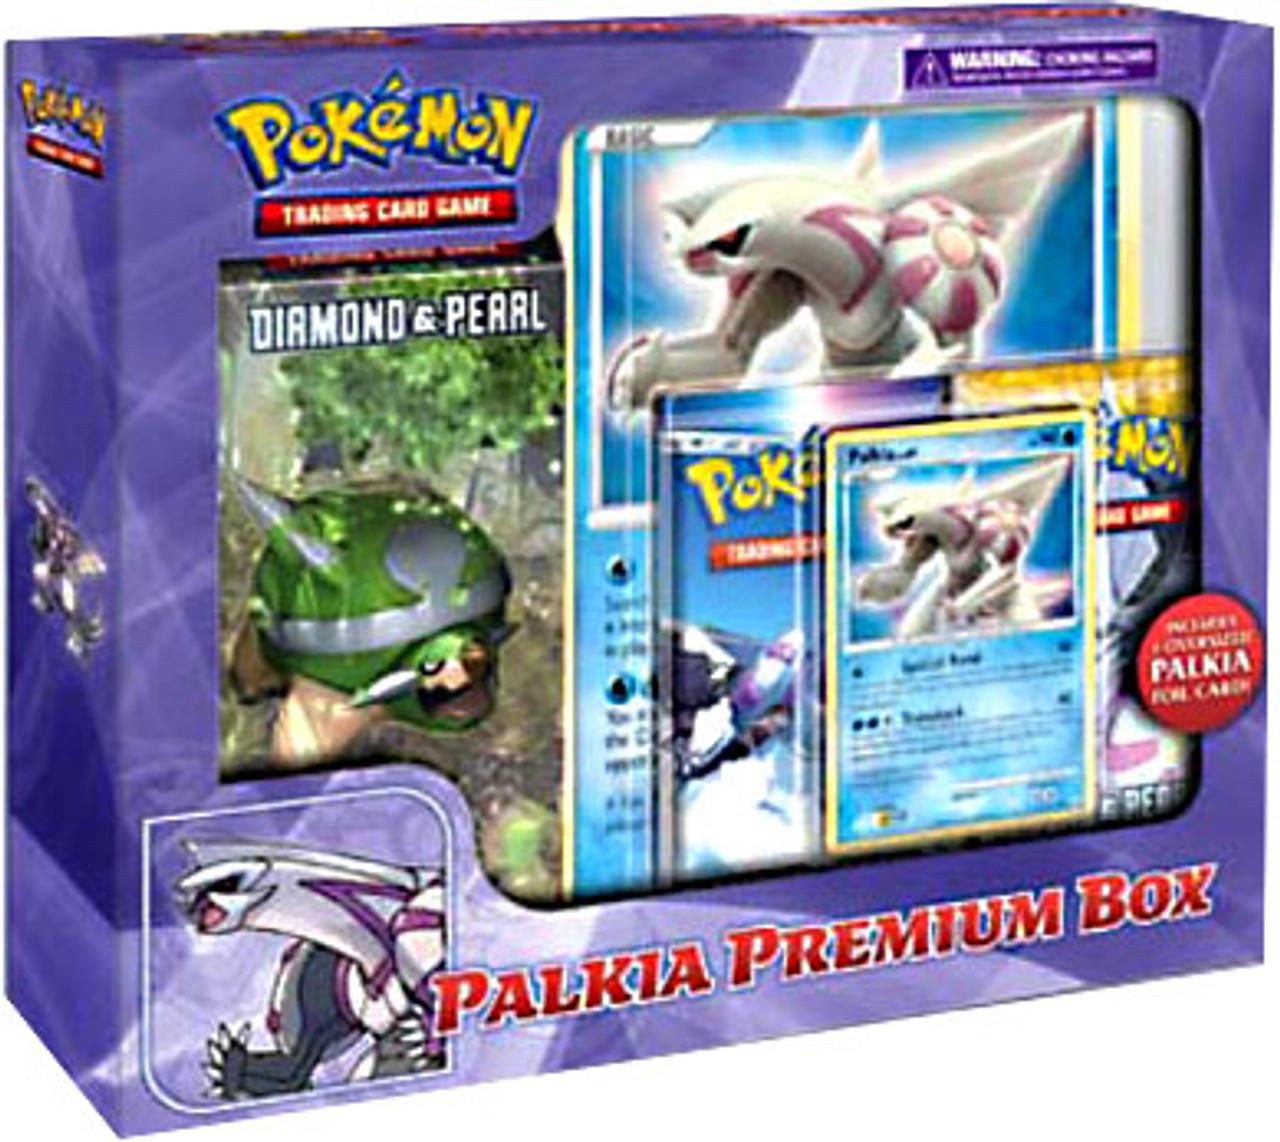 Pokemon Diamond & Pearl Palkia Premium Box